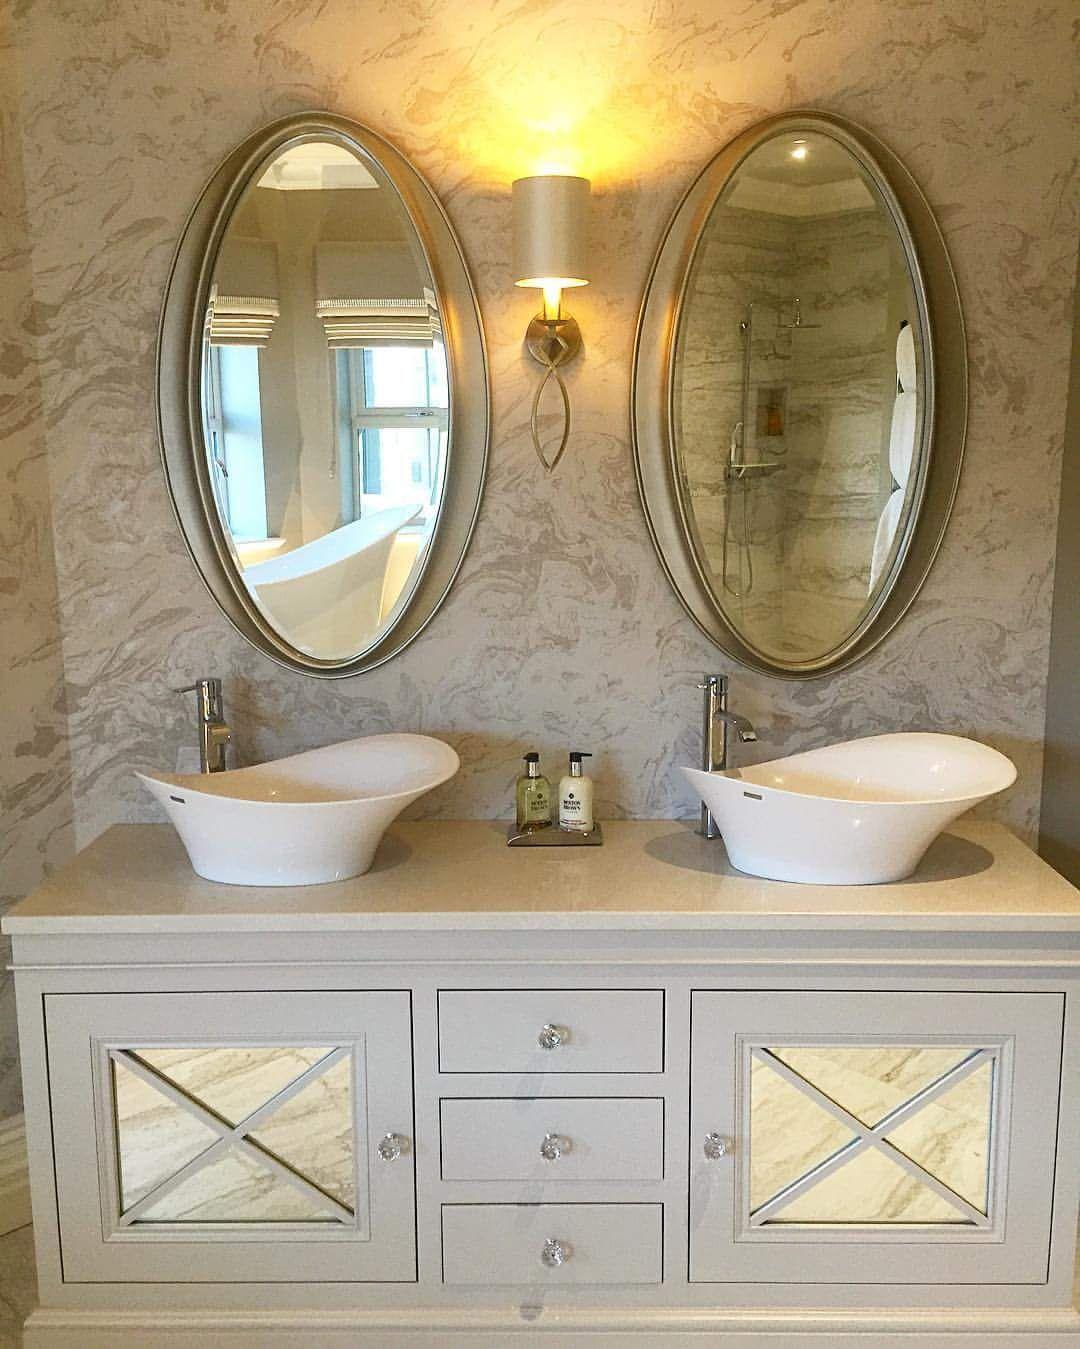 59 unbelievably incredible bathroom d cor essentials to help you rh pinterest com